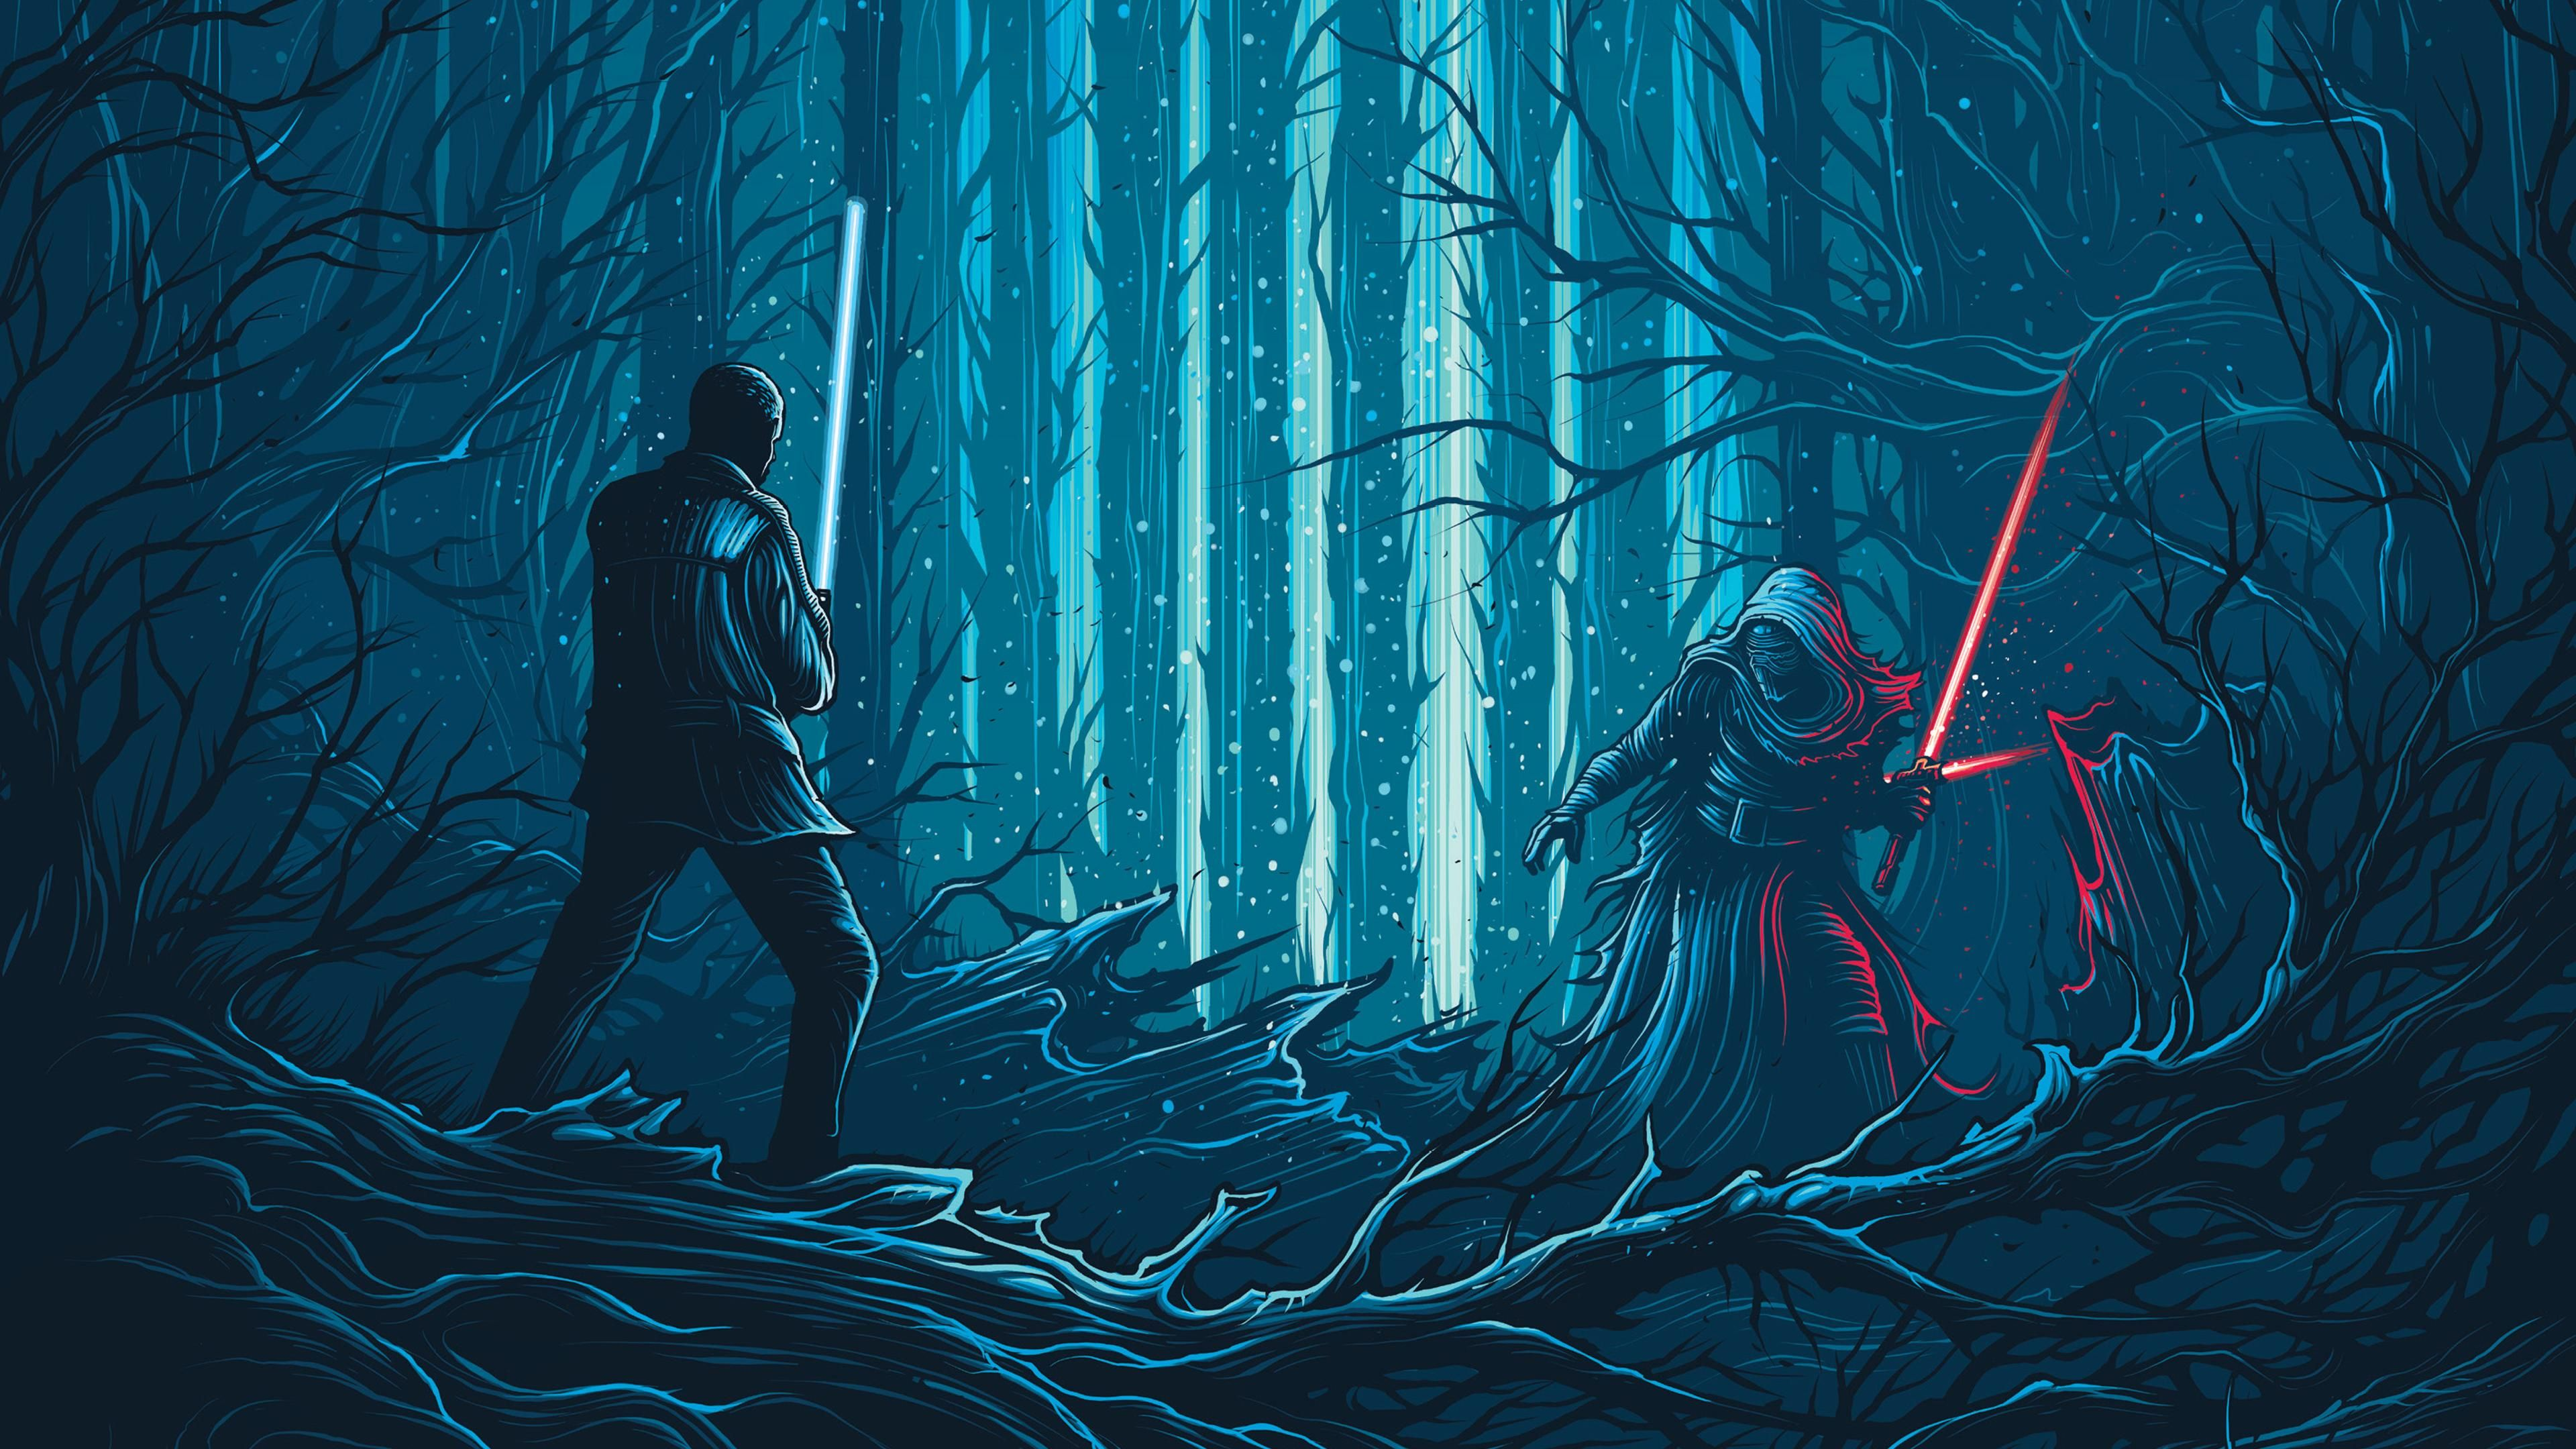 3840x2160 Star Wars 4k Screen Wallpaper Free 3840x2160 Star Wars Jedi Fallen Order Wallpaper 4k